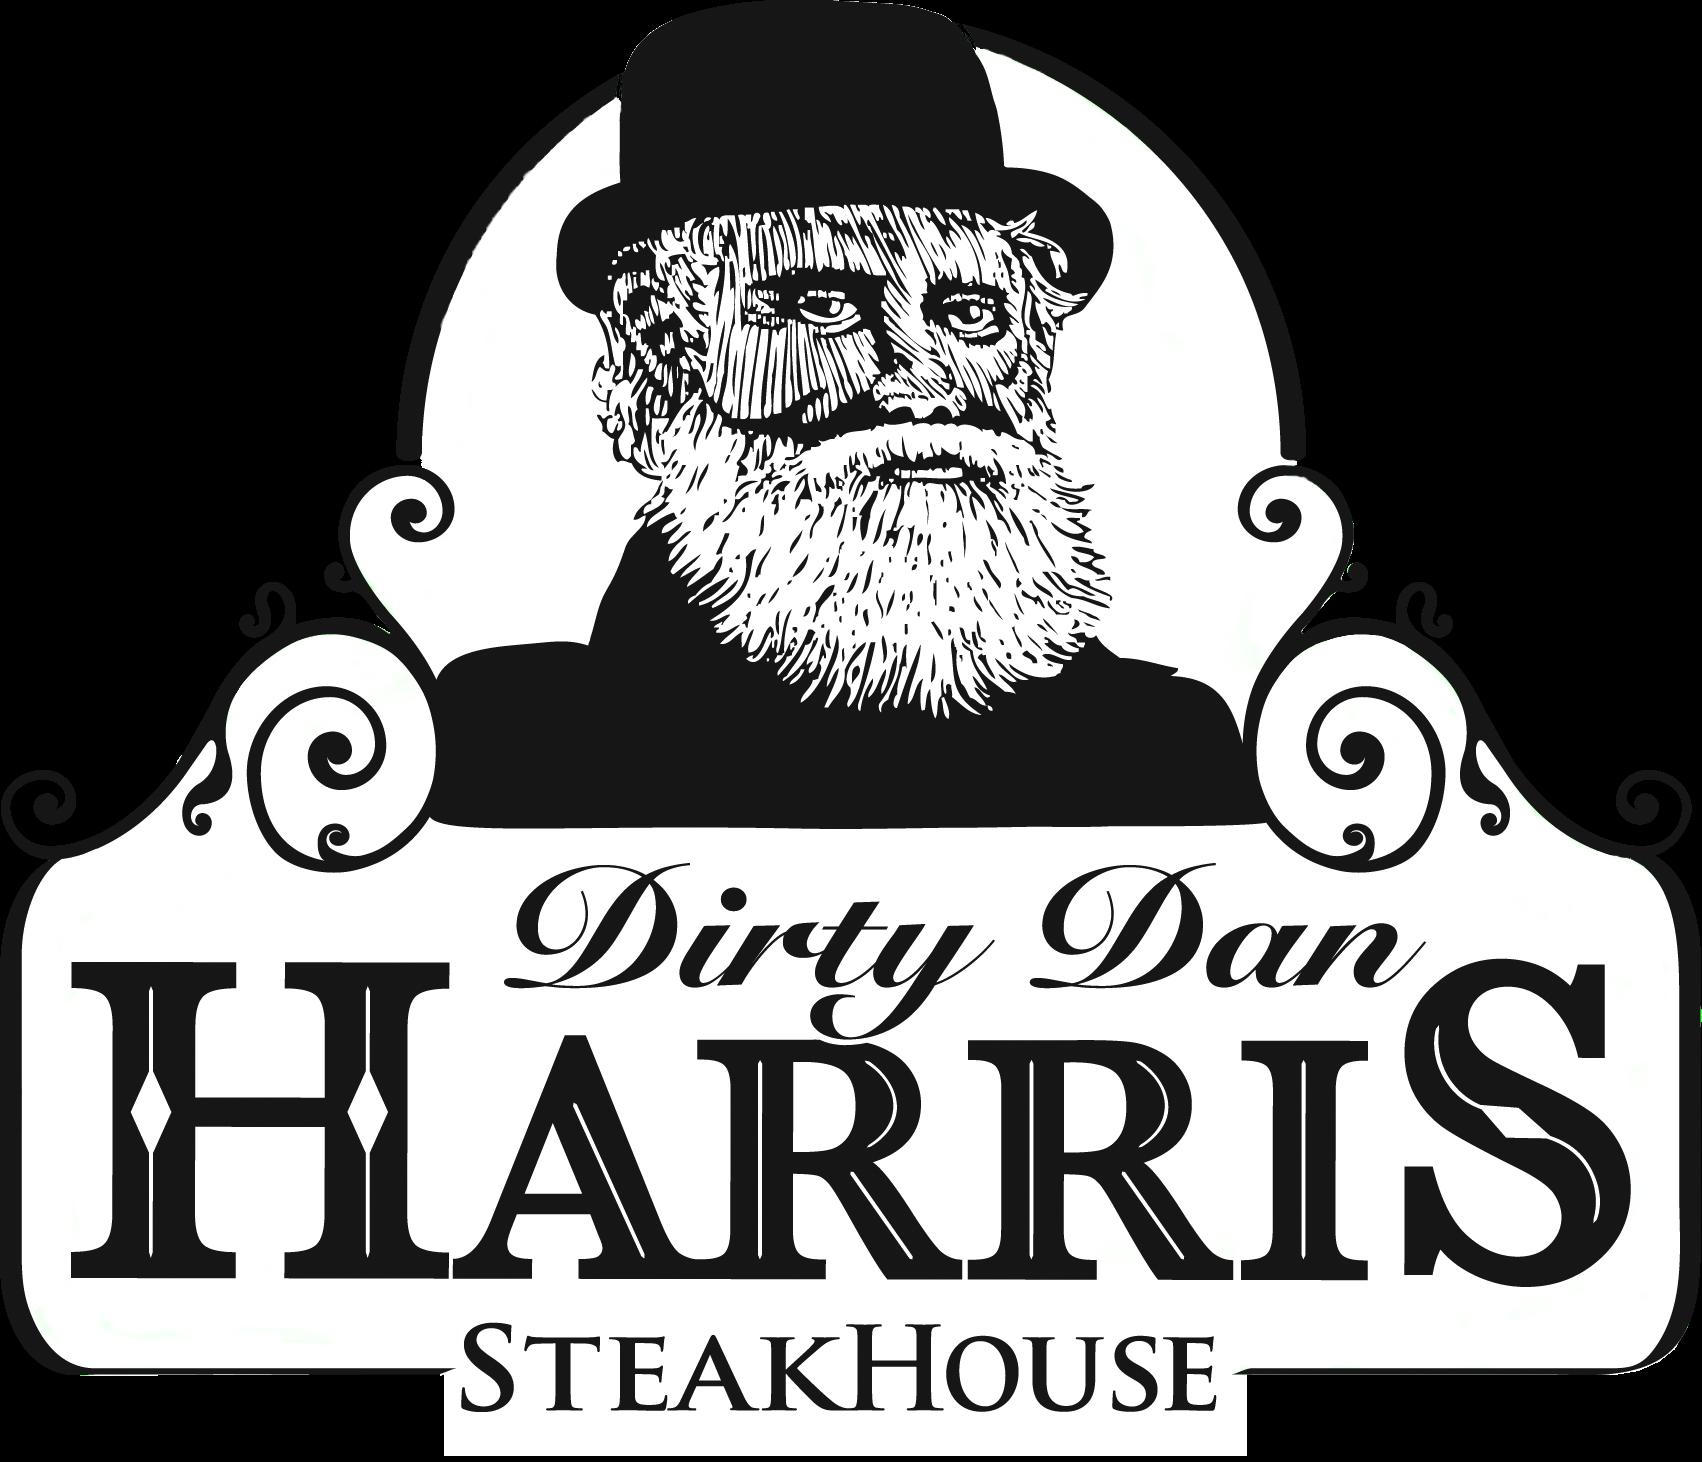 Dirty Dan Harris Steakhouse